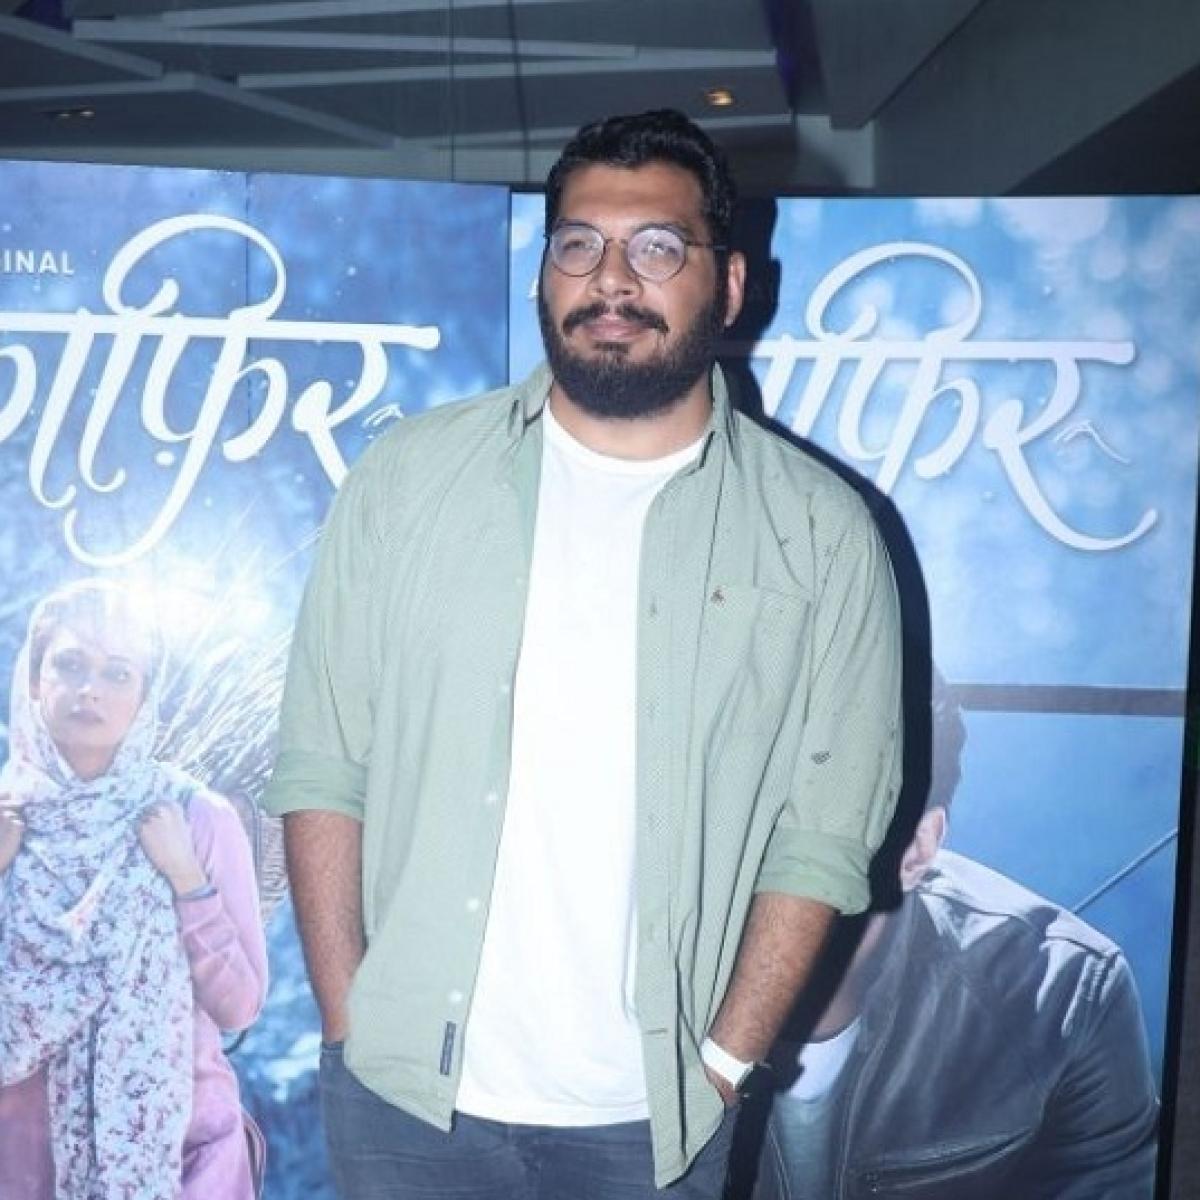 Cinema Journal Exclusive: Kayoze Irani's directorial debut to star Shefali Shah, Manav Kaul